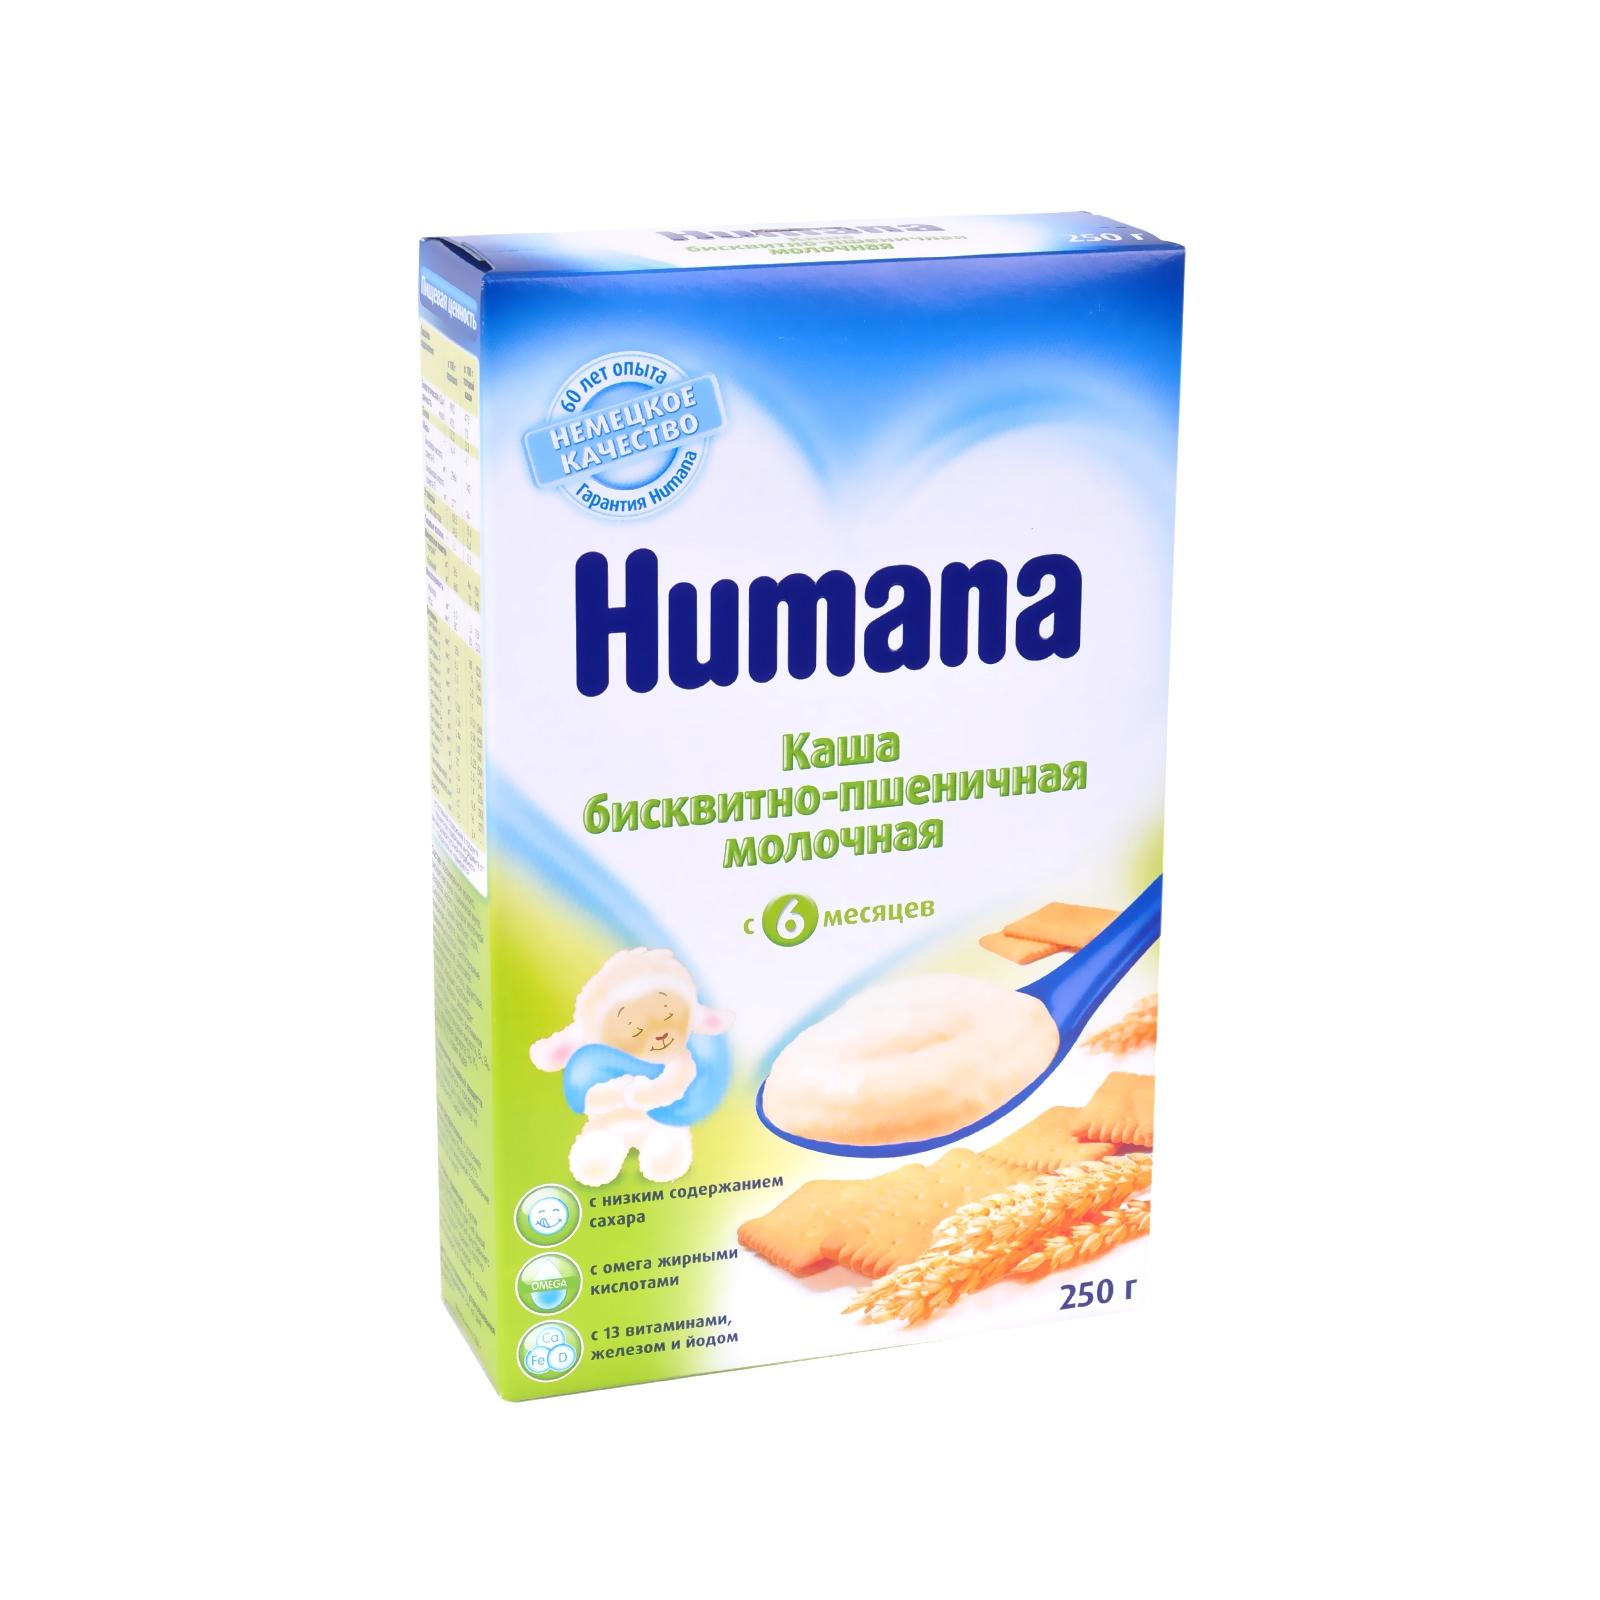 ���� Humana �������� 250 �� ���������-��������� (� 6 ���)